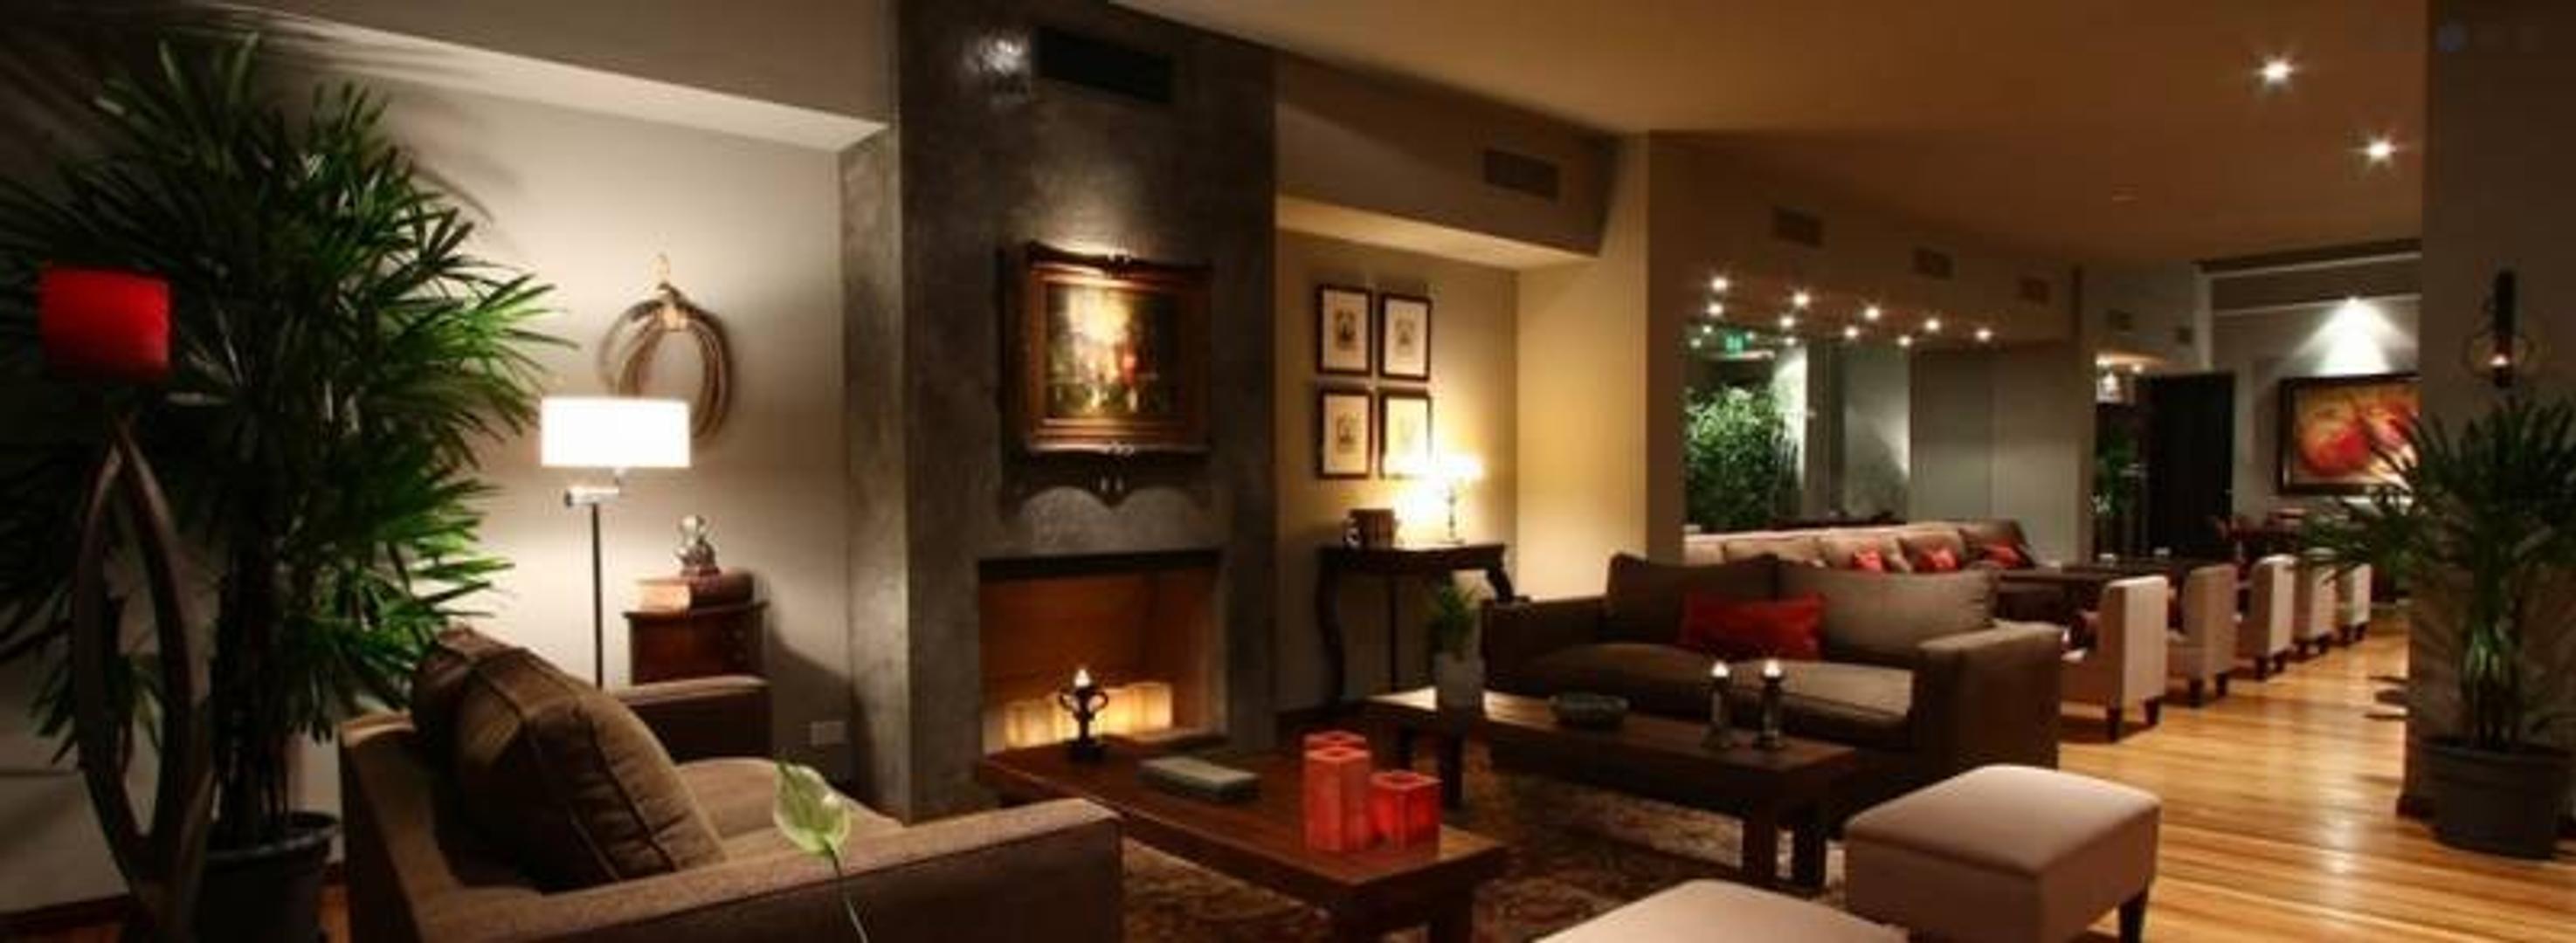 HOTEL BOUTIQUE muy exclusivo Gurruchaga 1400